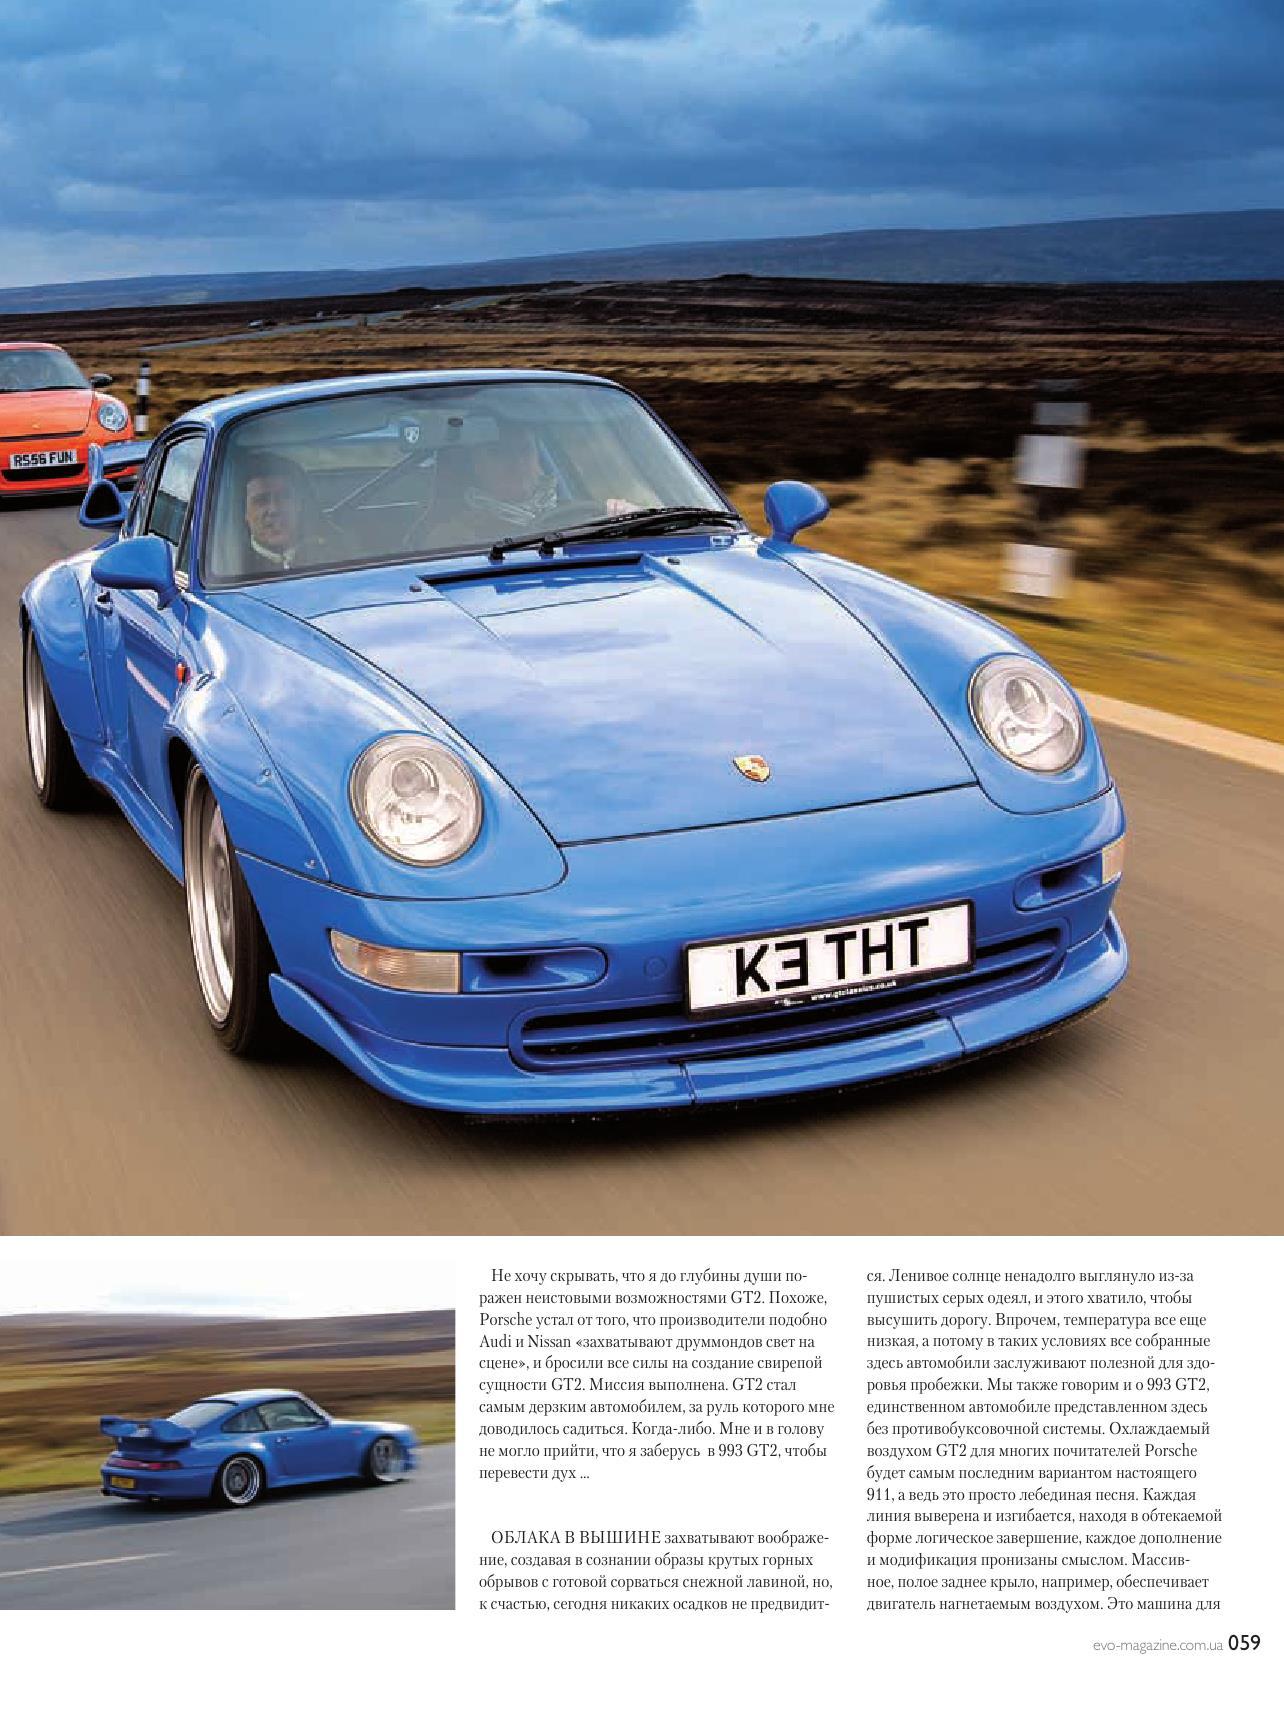 Porsche 980 Carrera GT & Porsche 993 GT2 & Porsche 997 GT3 RS ... on blue boxster, blue delorean, blue yenko, blue smart, blue infinity, blue yugo, blue bentley, blue fiat, blue noble, blue lincoln, blue prowler, blue murcielago, blue mitsubishi, blue isetta, blue 944 turbo, blue gto, blue suzuki, blue maserati, blue berlinetta, blue mini,